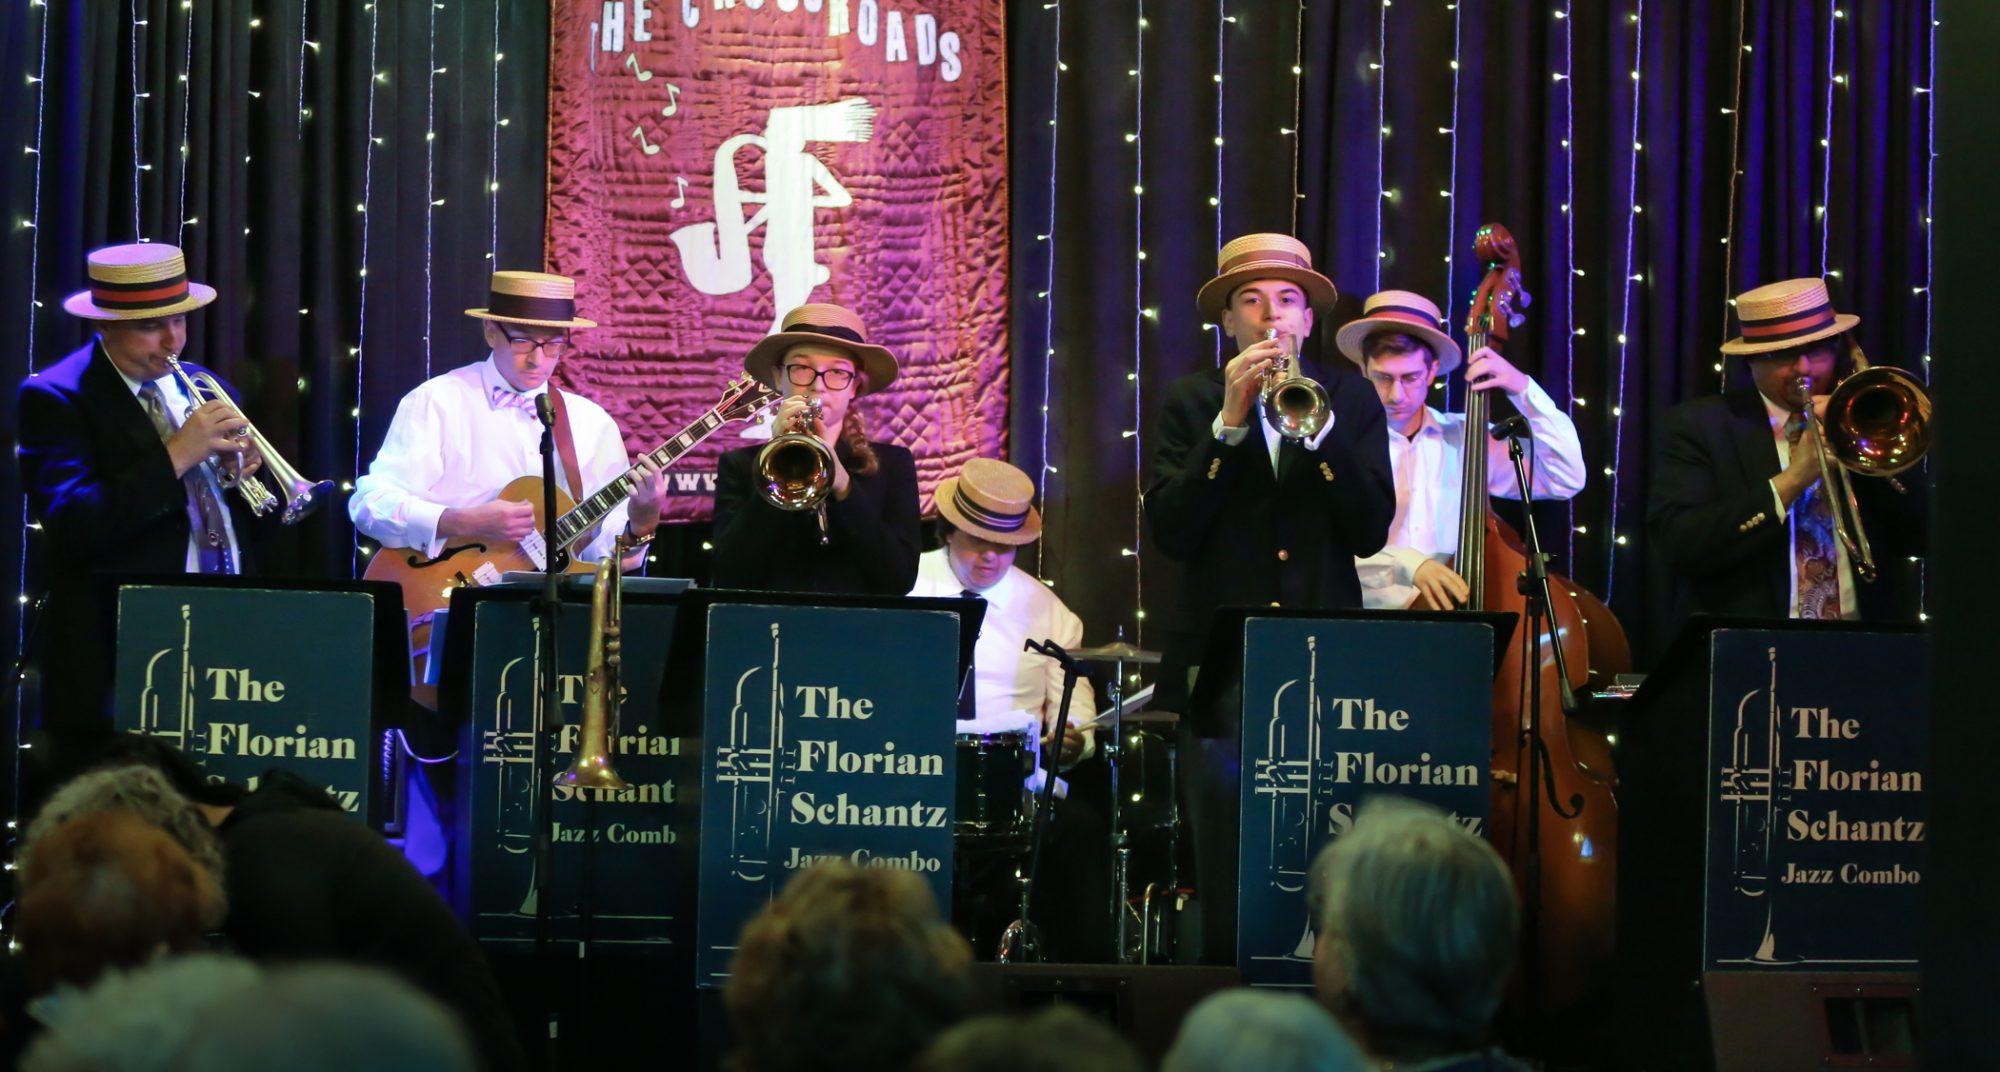 Florian Schantz Jazz Combo